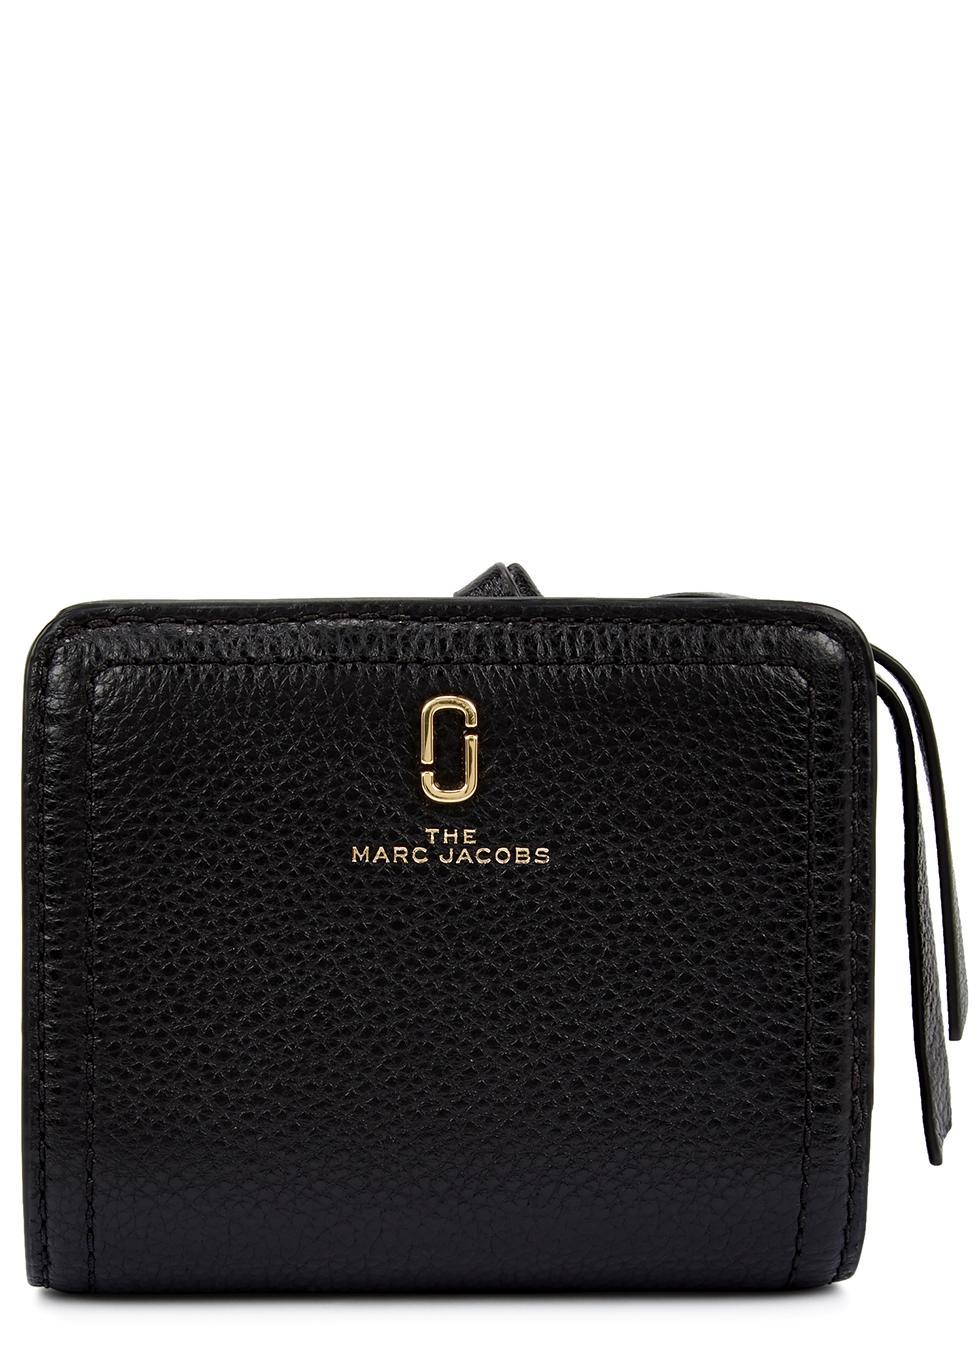 The Softshot black leather wallet